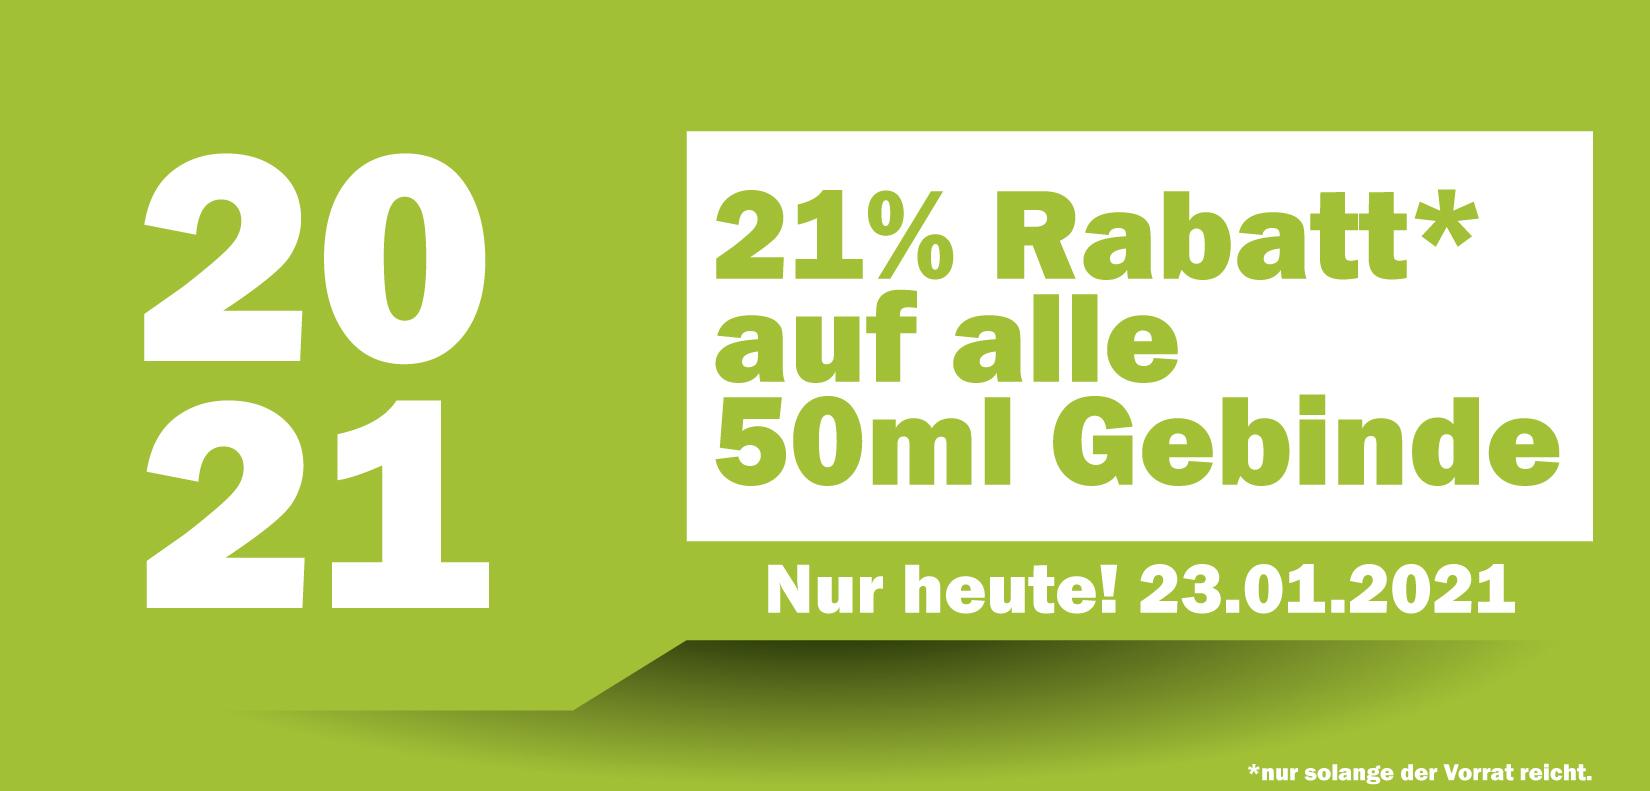 Aroma Wochenenddeal Angebot 2021 by ASM®